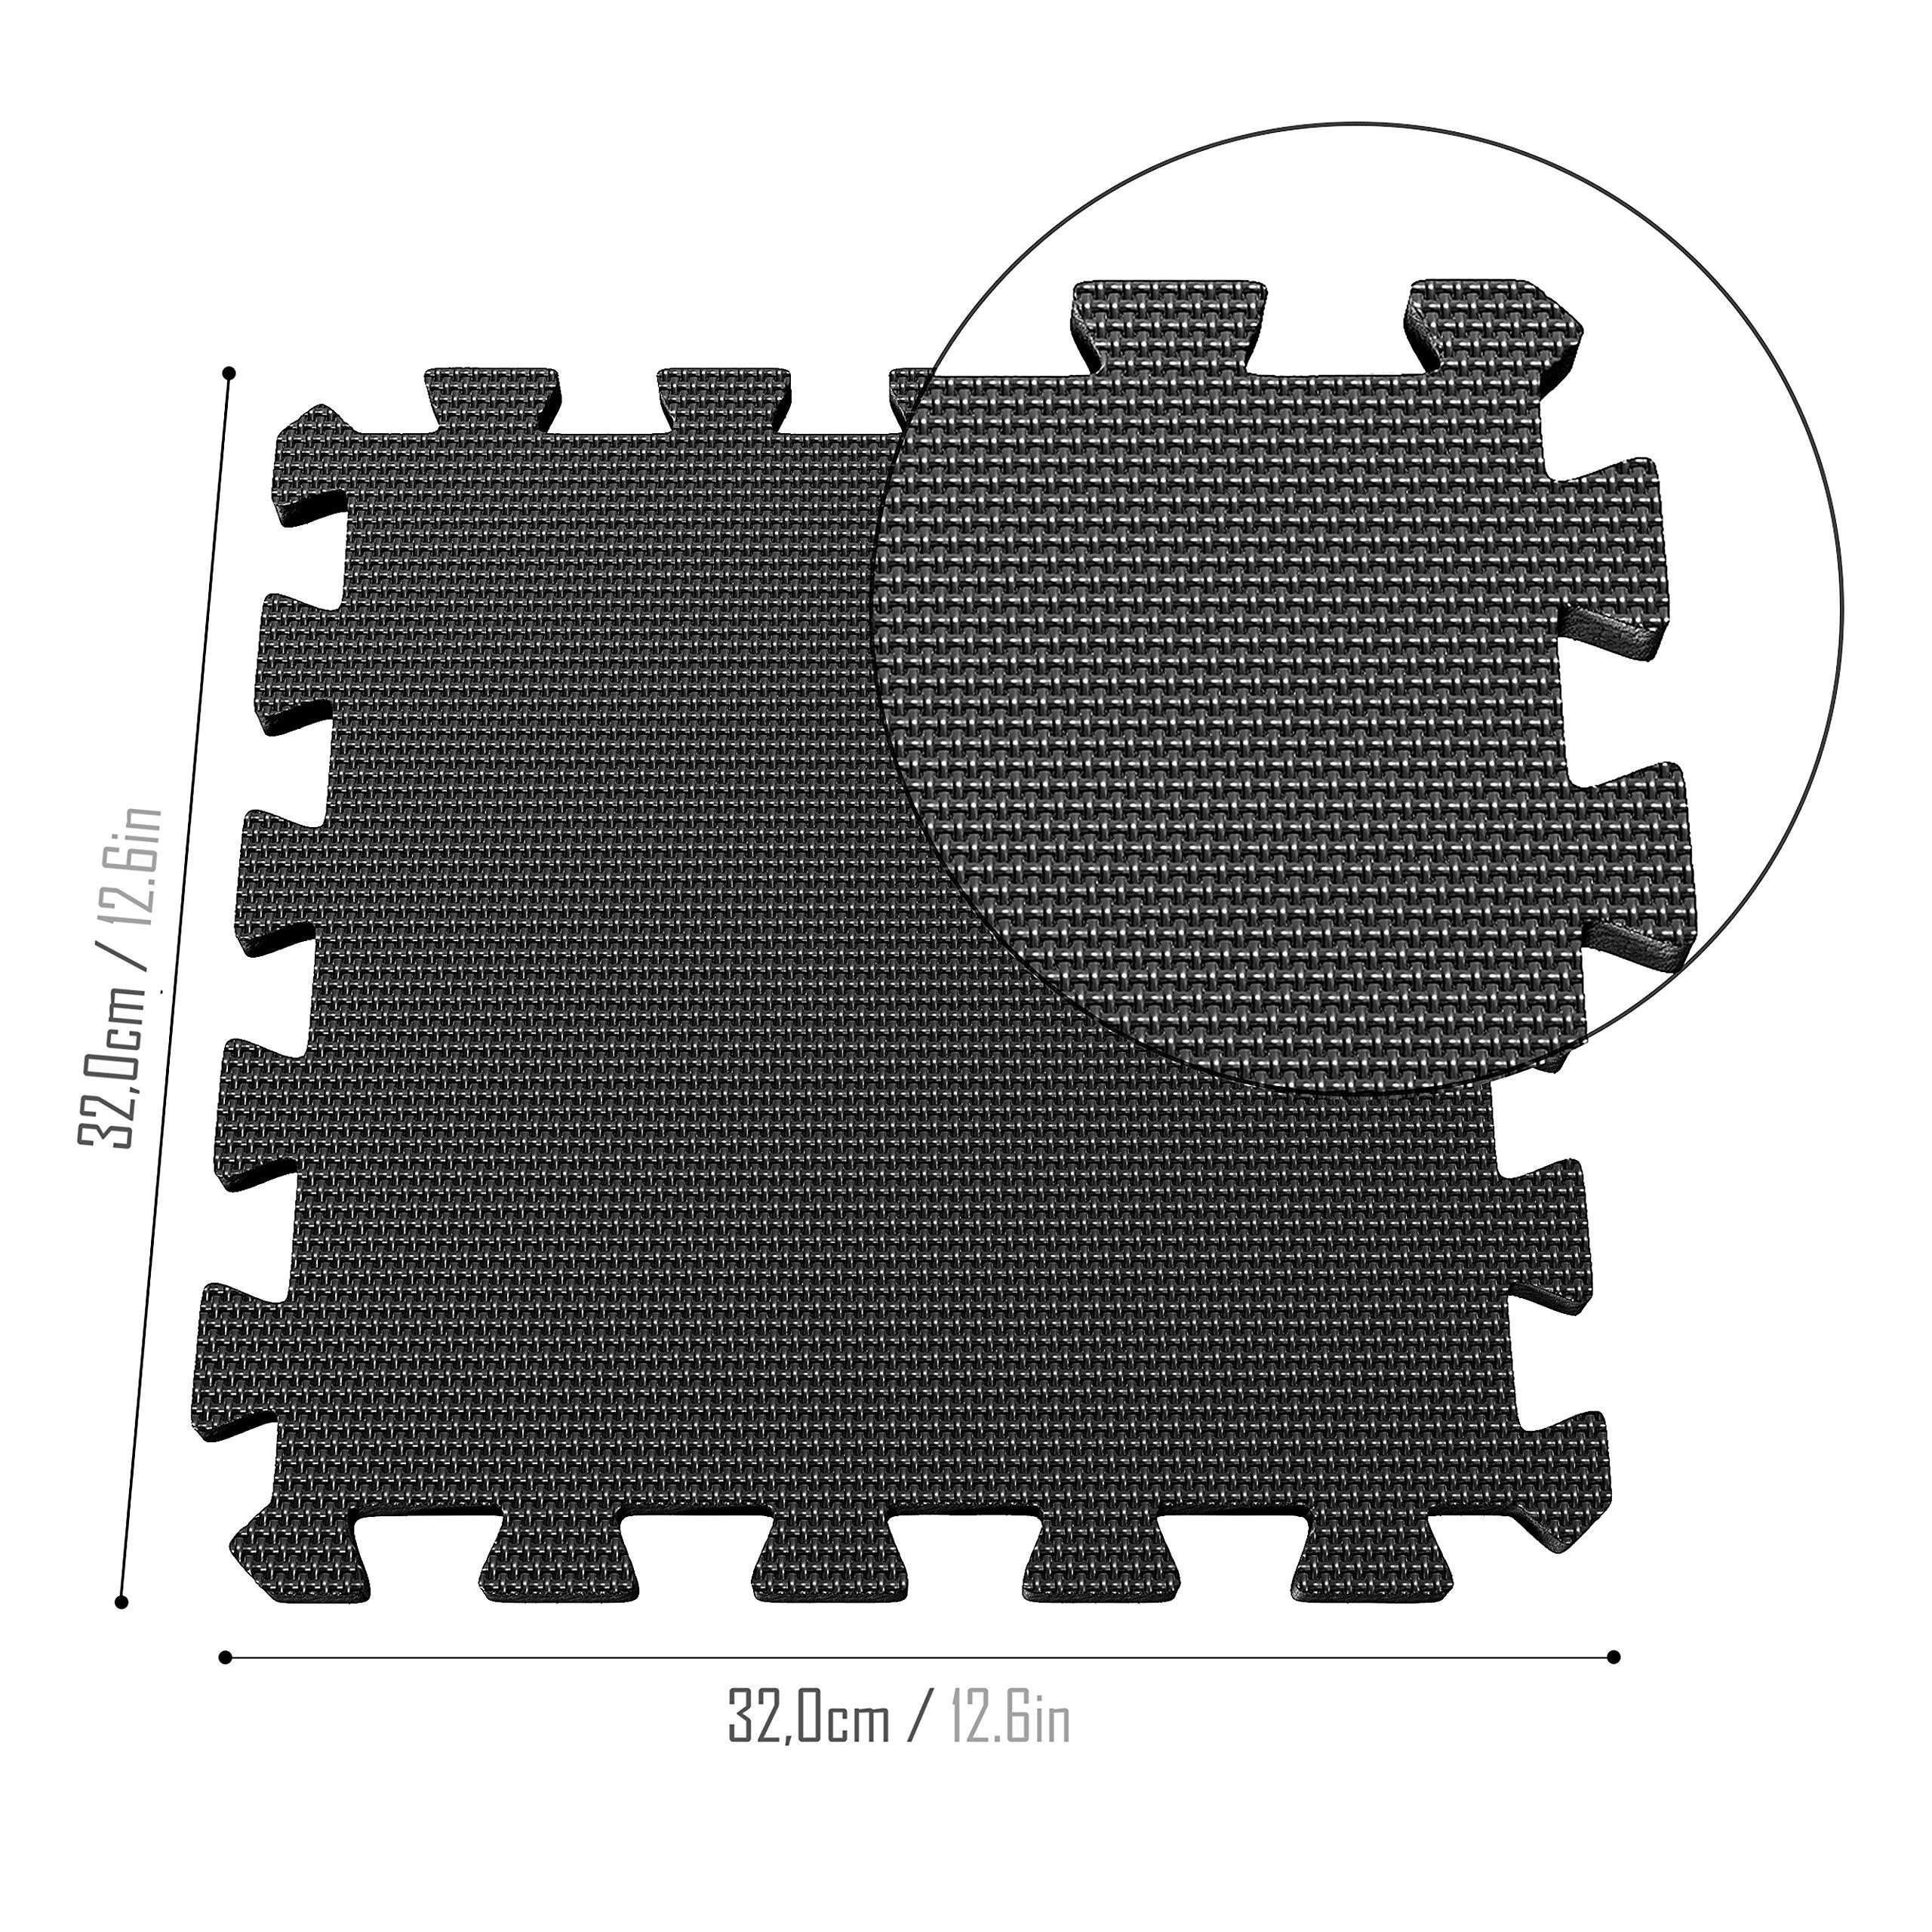 Interlocking Soft Foam Floor Mats